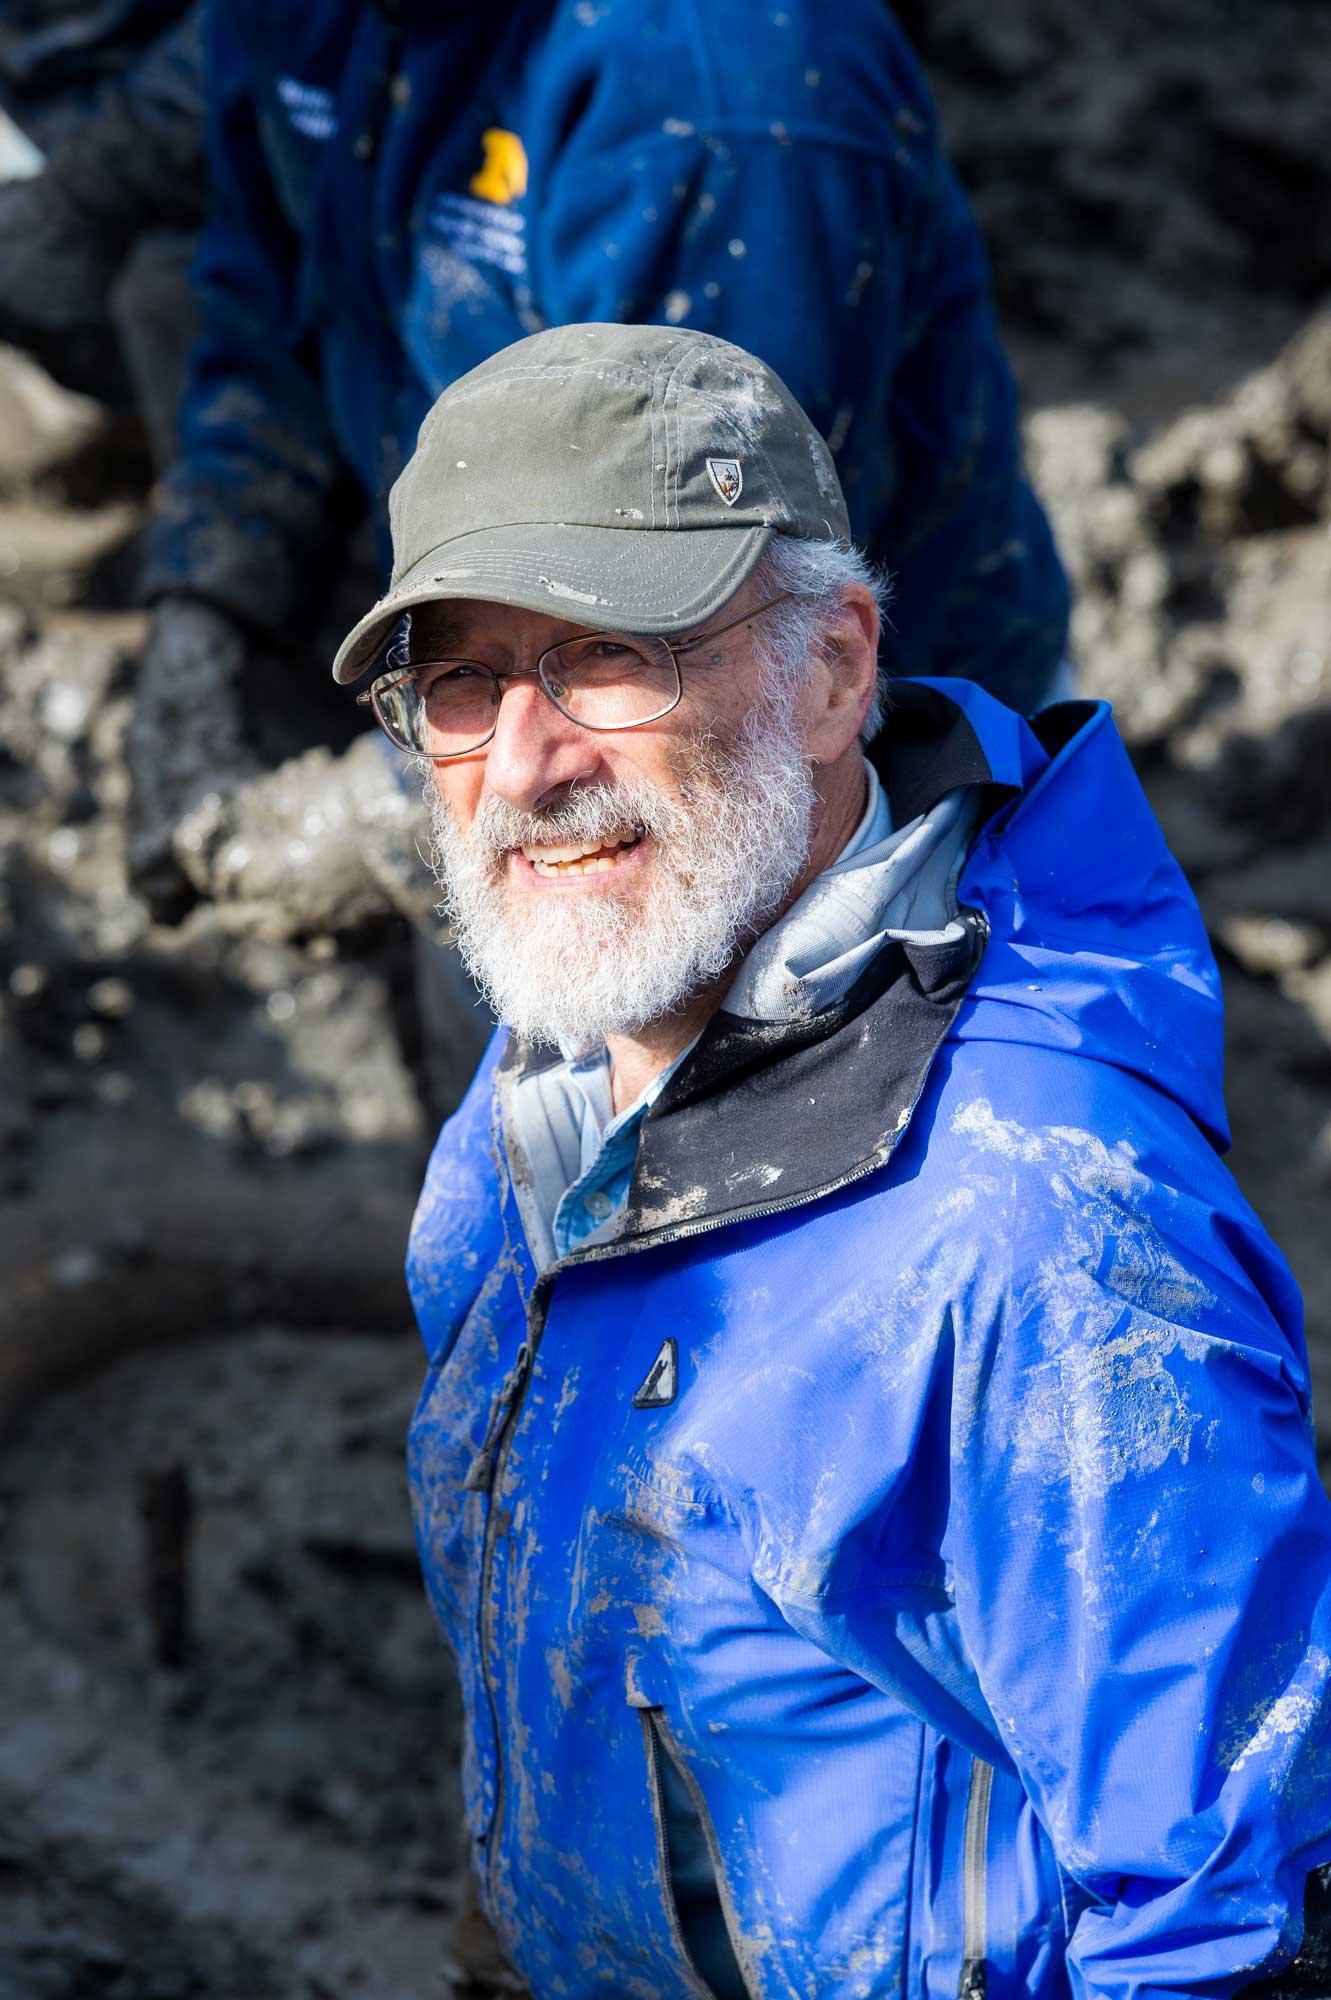 University of Michigan paleontologist Daniel Fisher. Image credit: Daryl Marshke/Michigan Photography